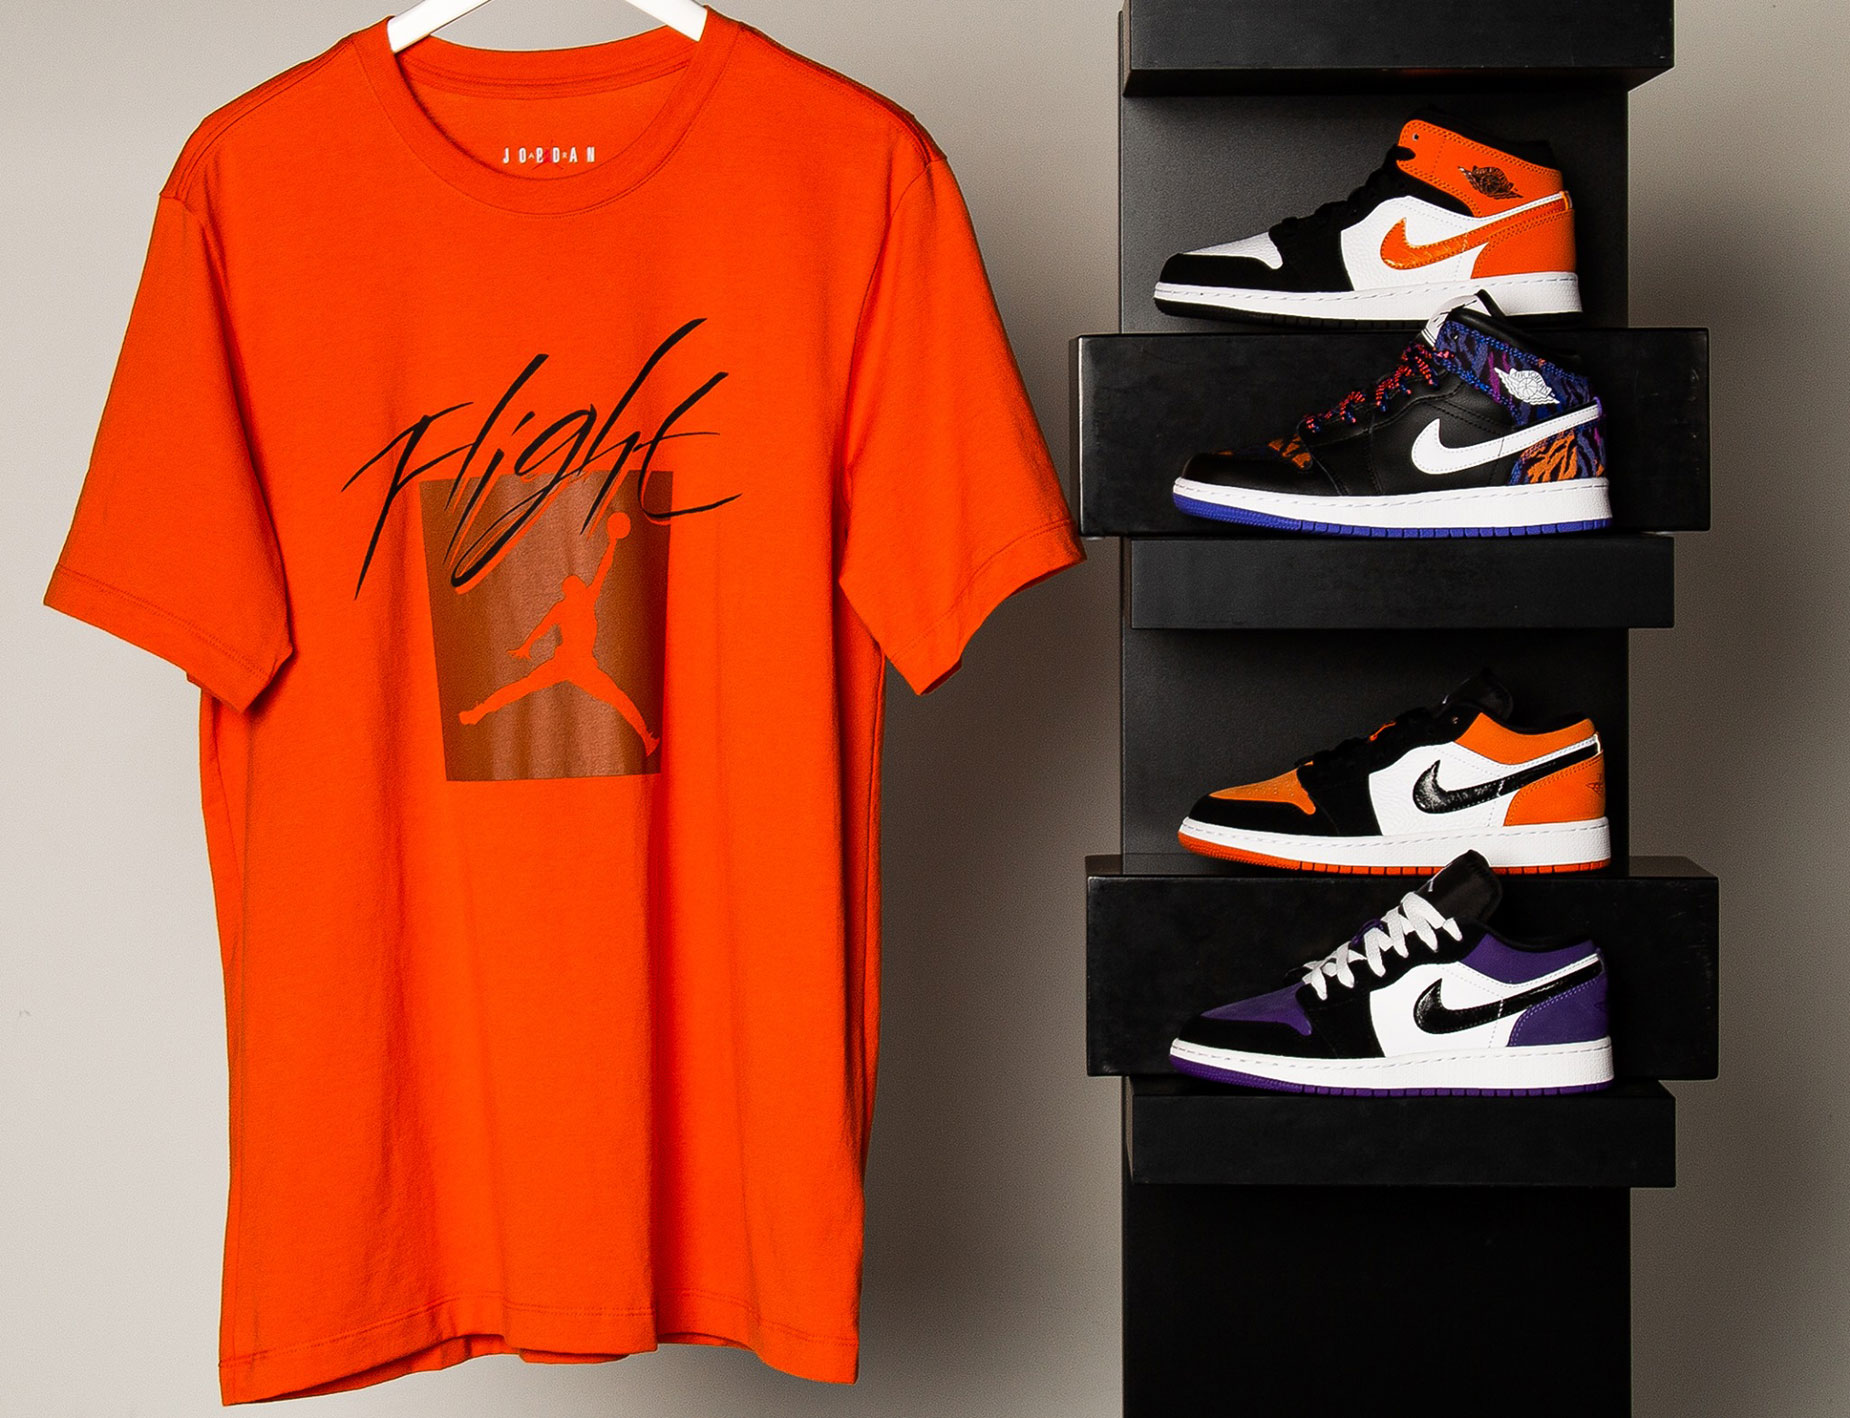 black-friday-2019-sale-jordan-shirts-shoes